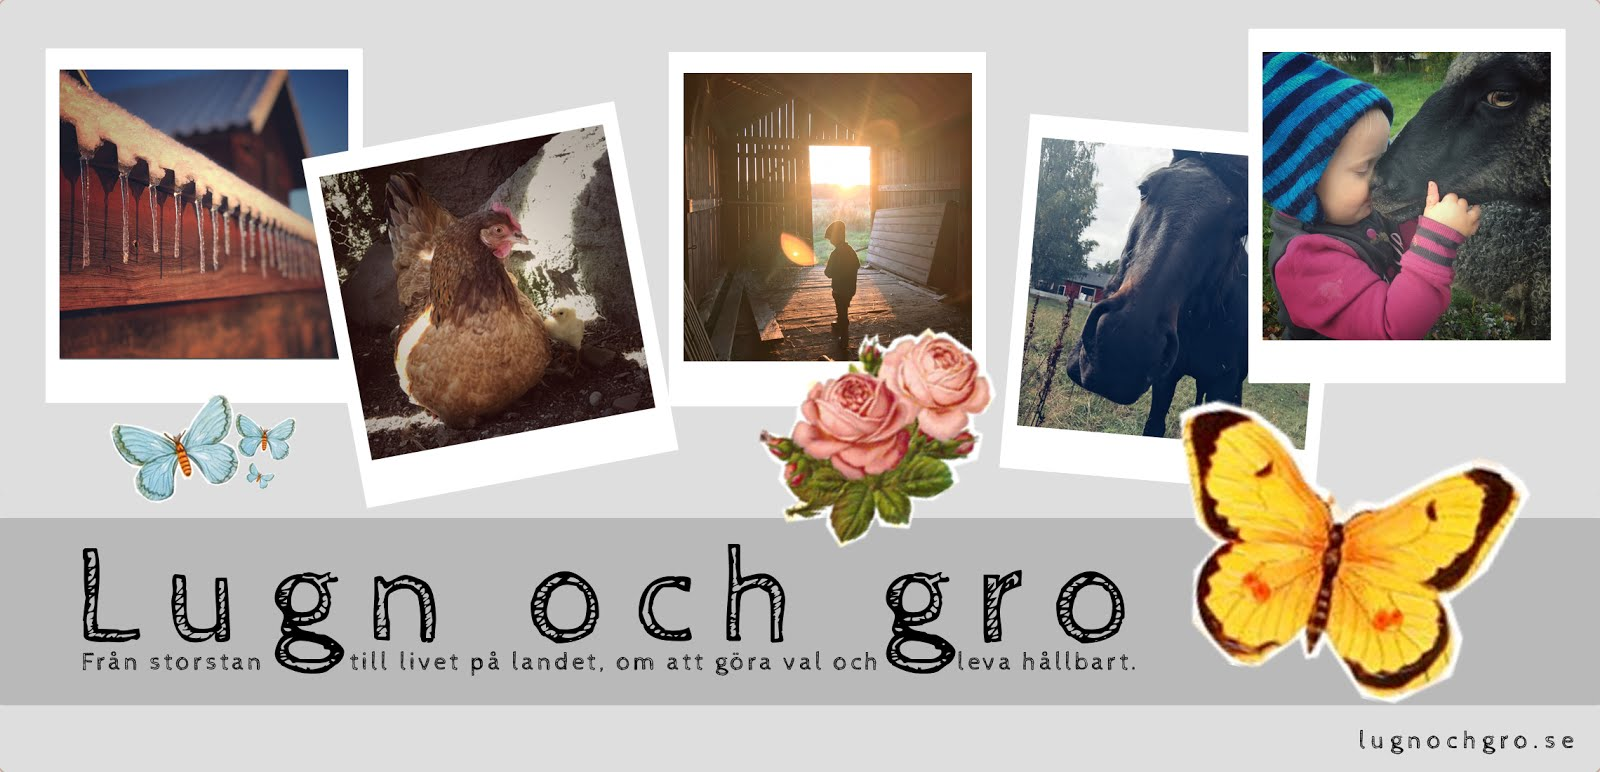 Lugn & gro - en blogg om livet på landet